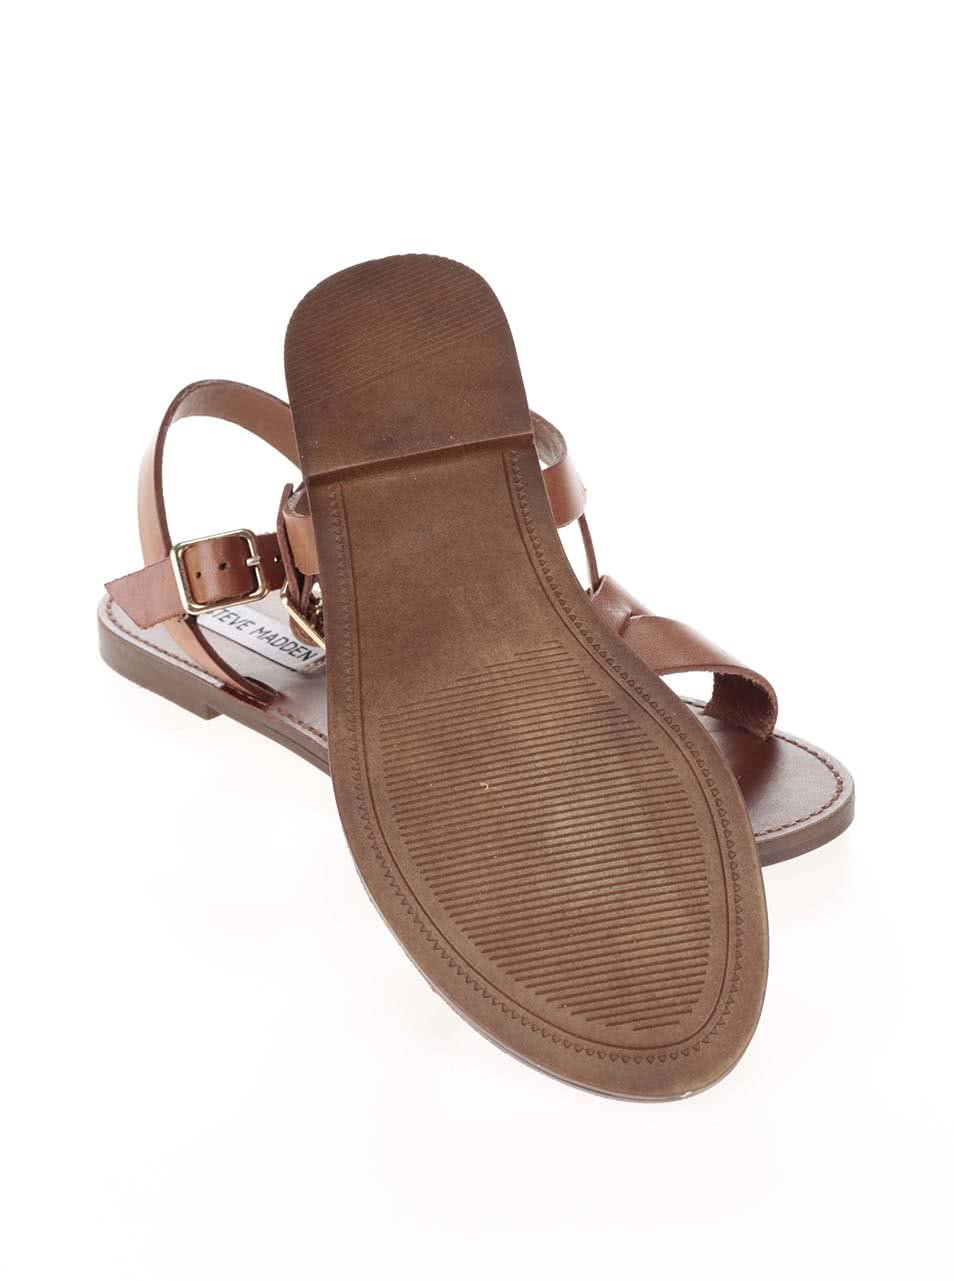 7210383cd838 Hnedé dámske kožené sandále Steve Madden Dublin ...